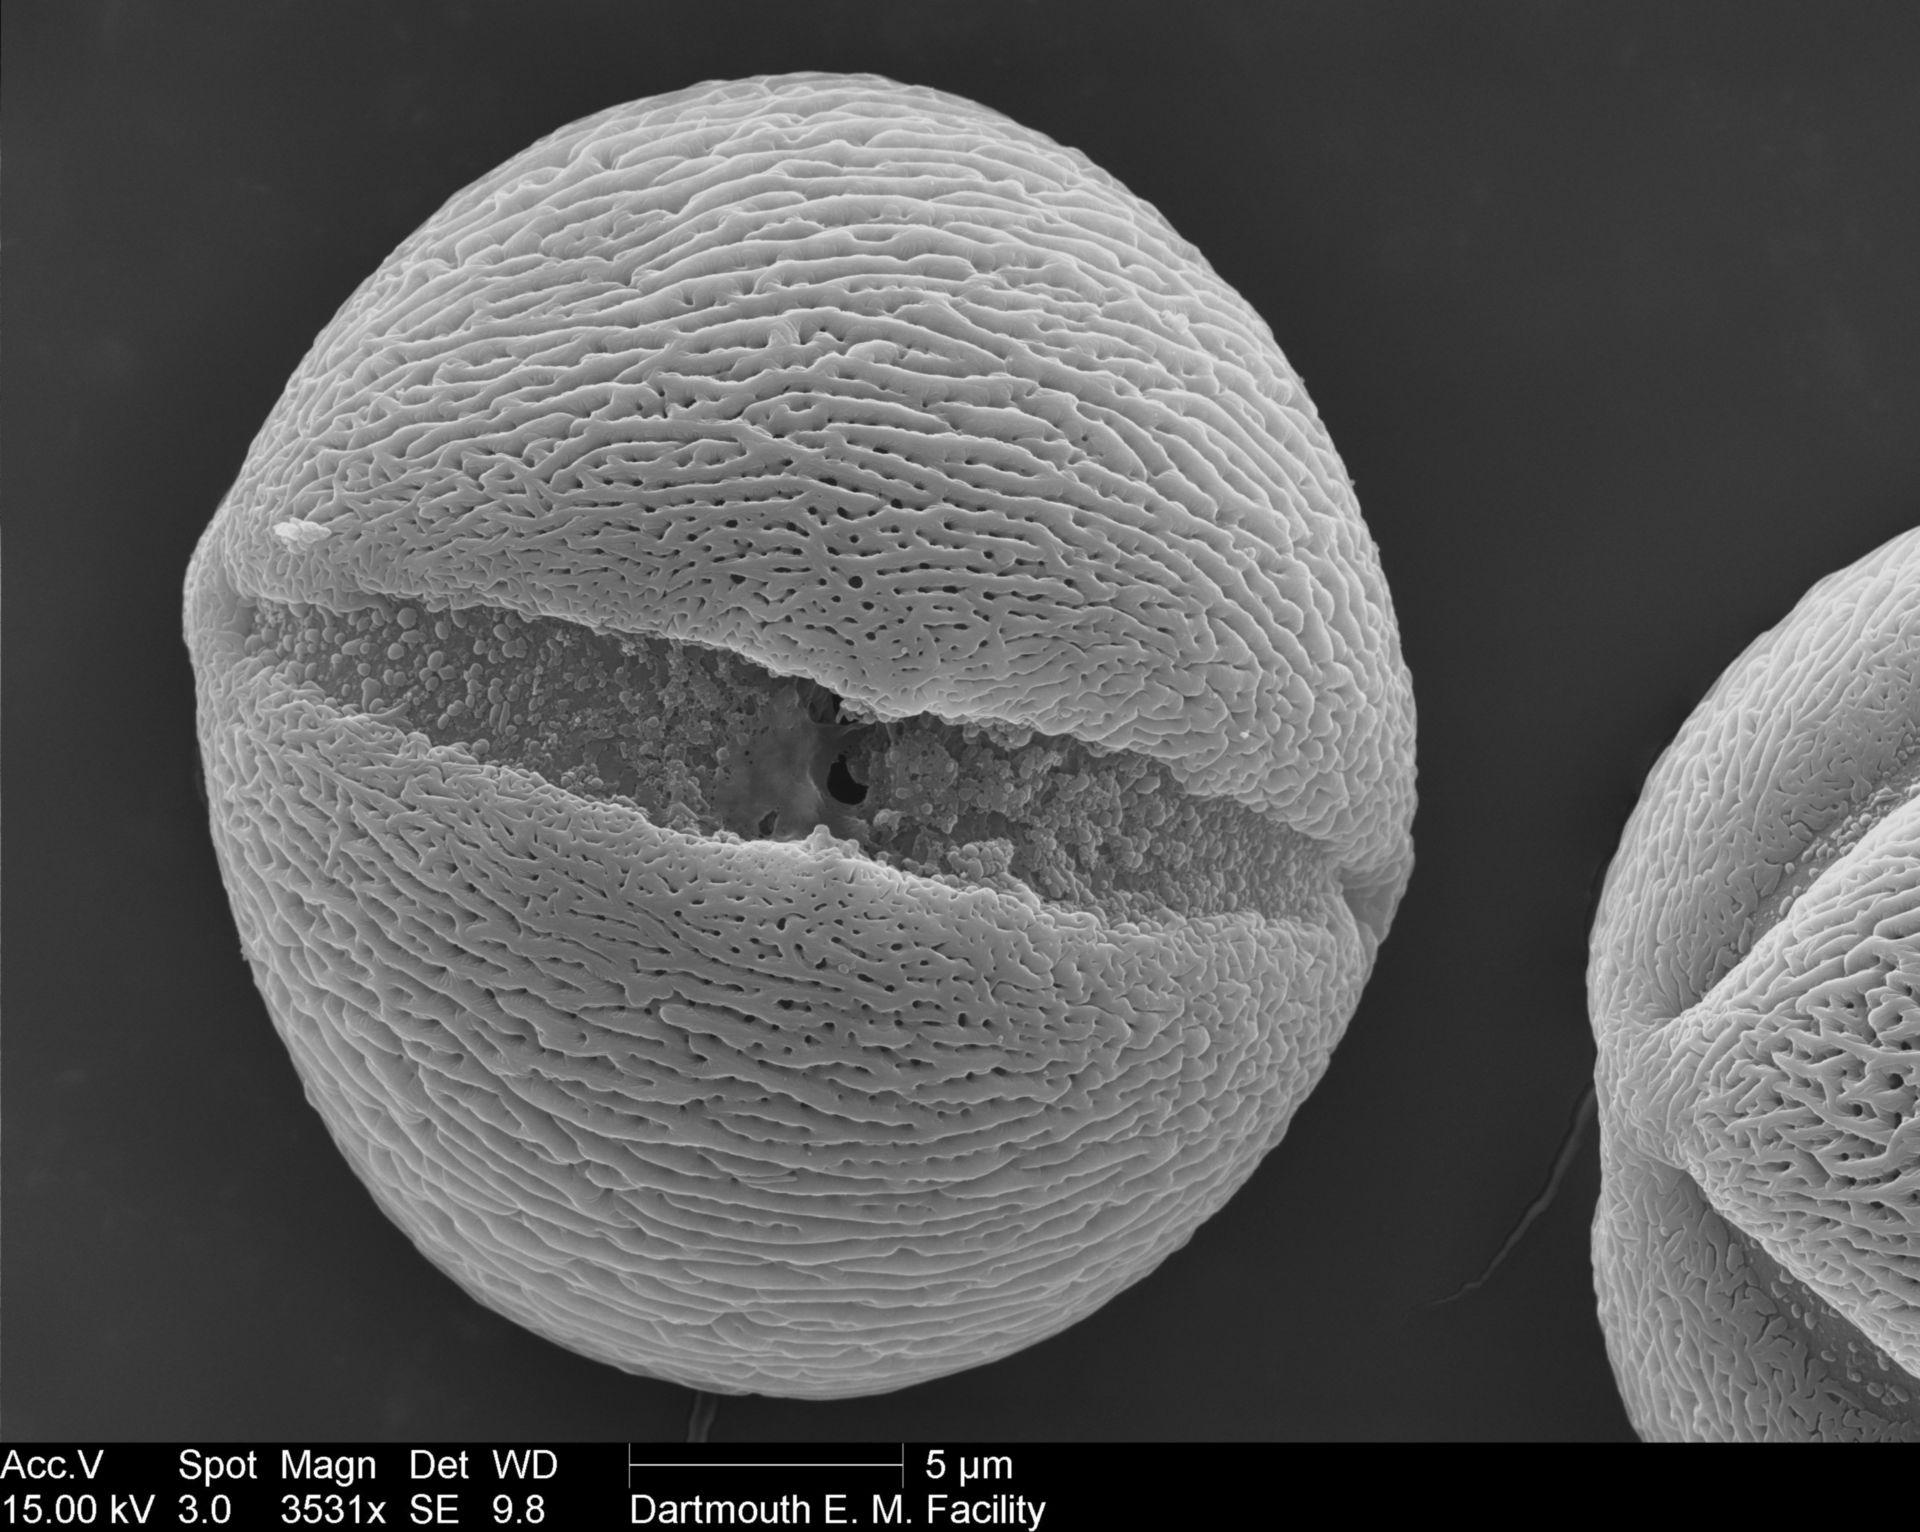 Petunia (Pollen wall) - CIL:40300